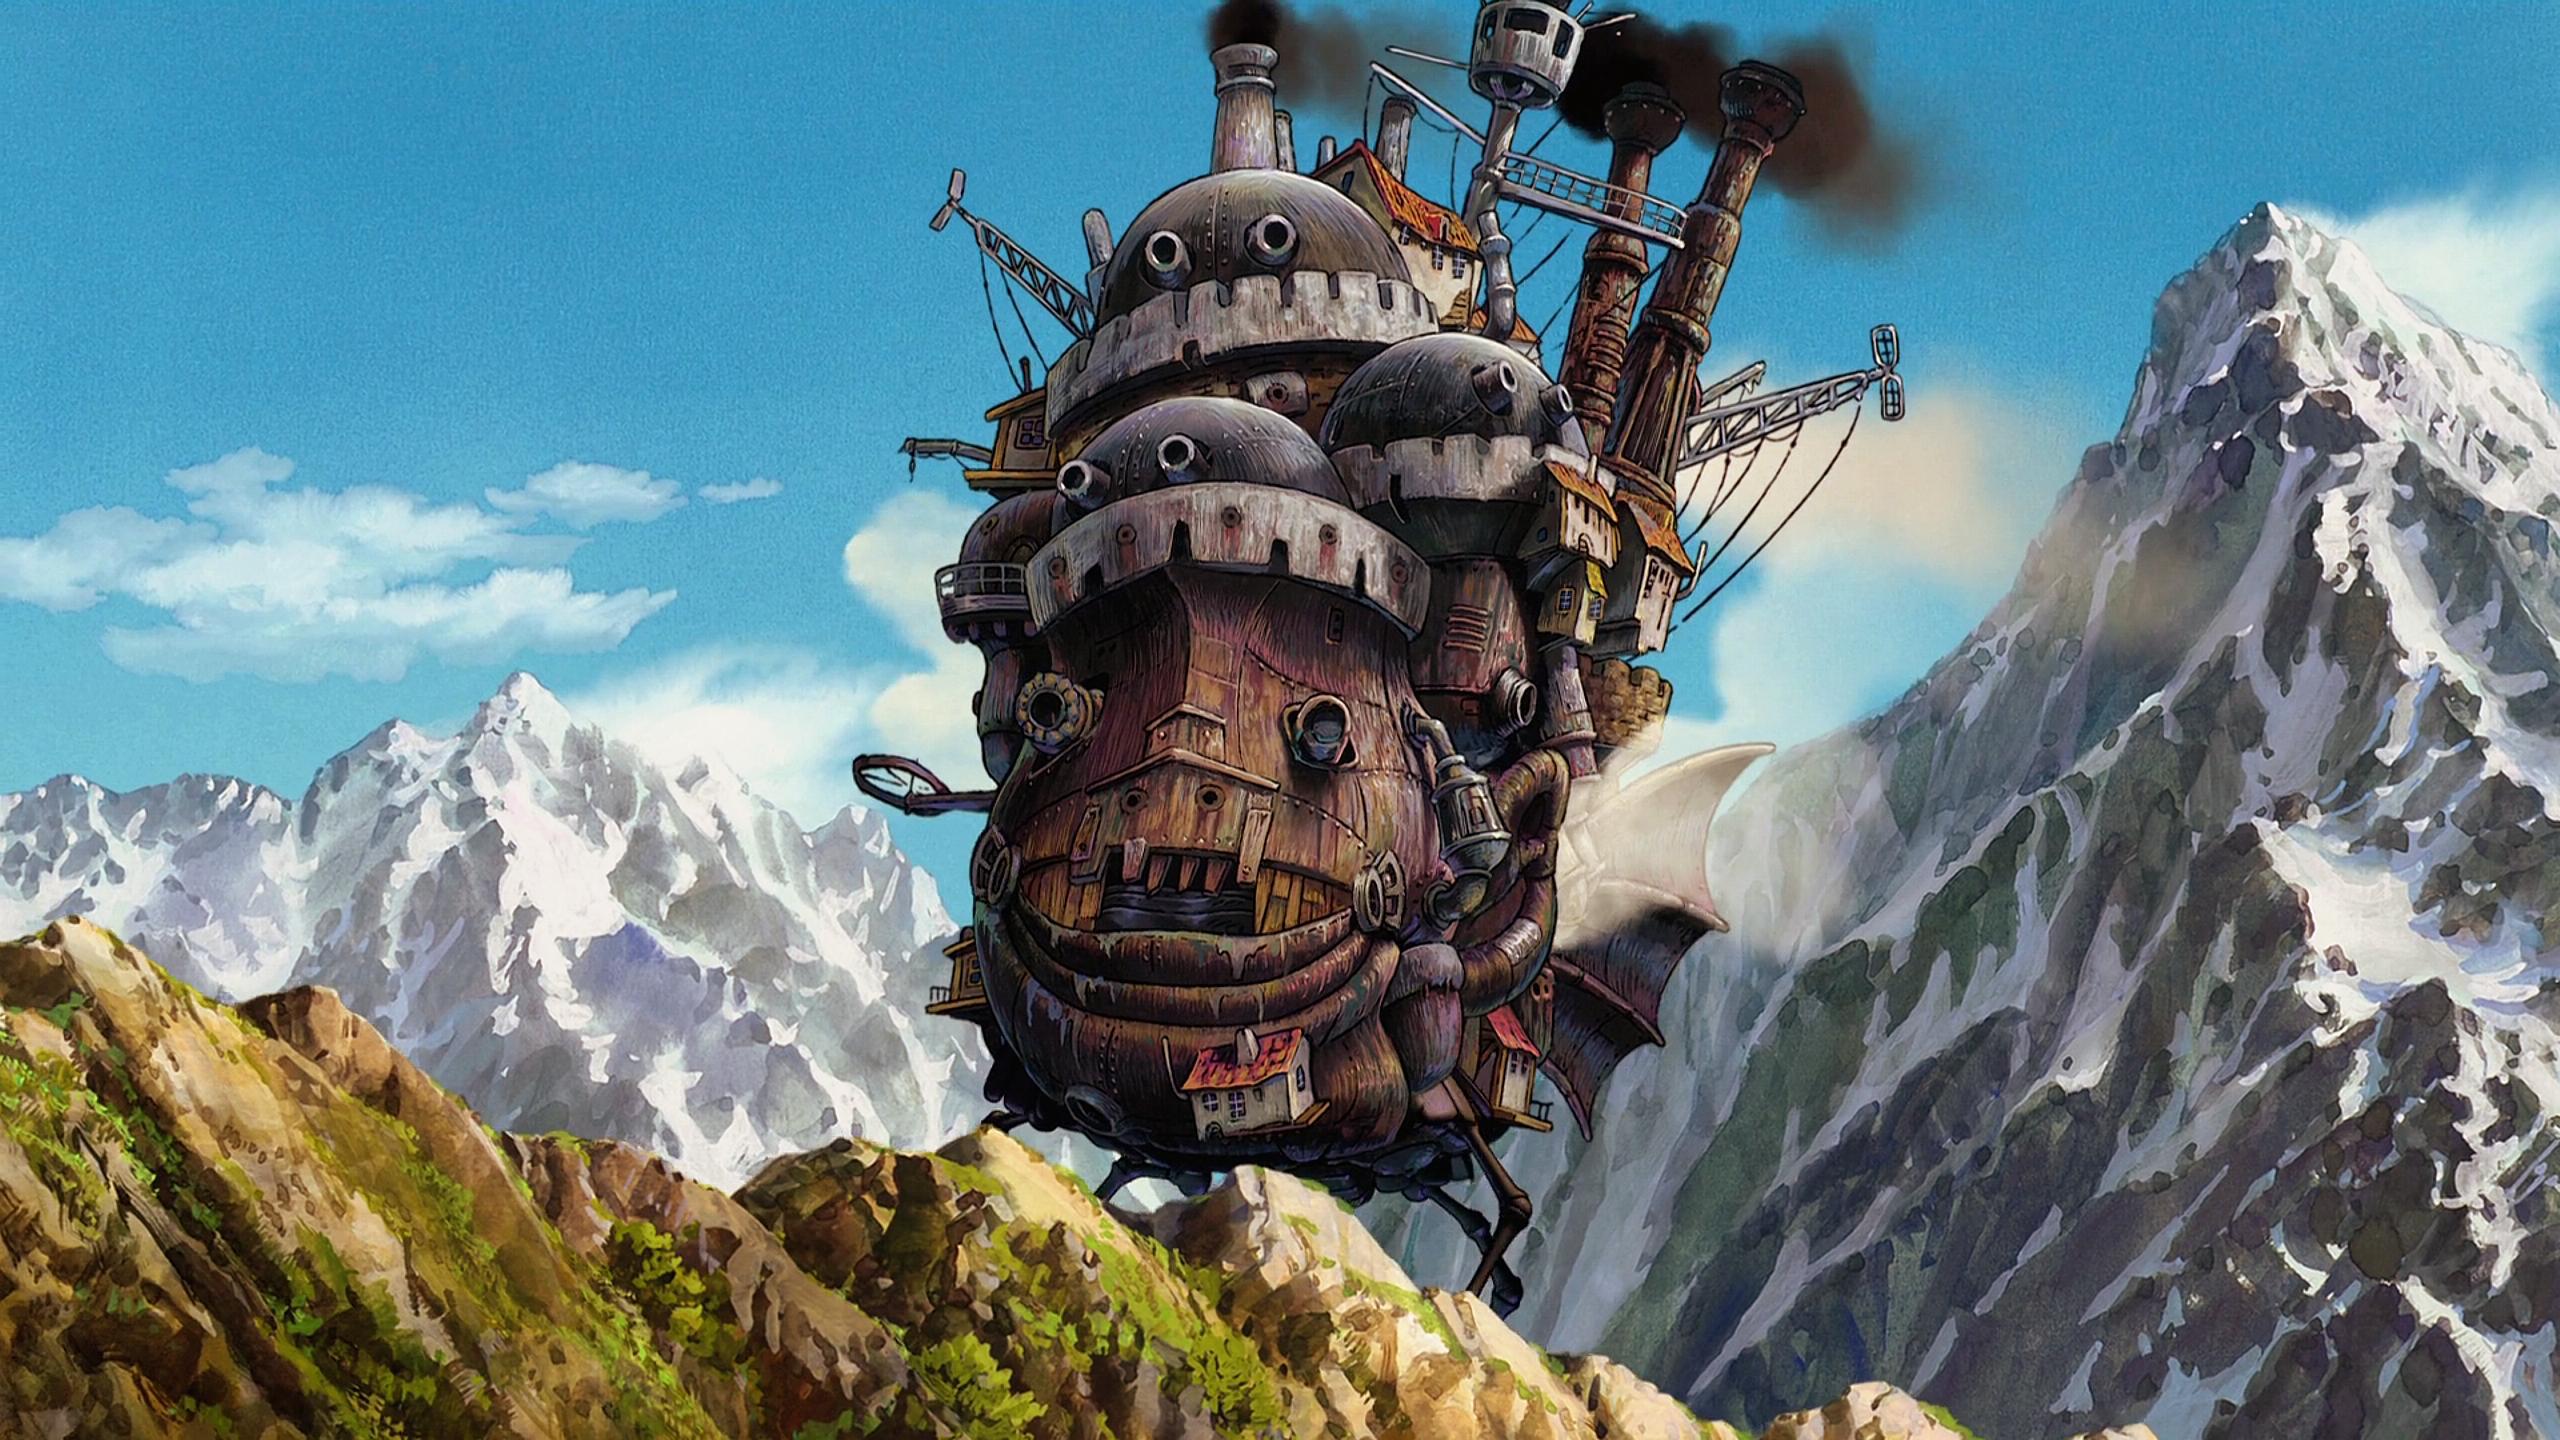 Celebrate The 75th Birthday Of Hayao Miyazaki With These 2560x1440